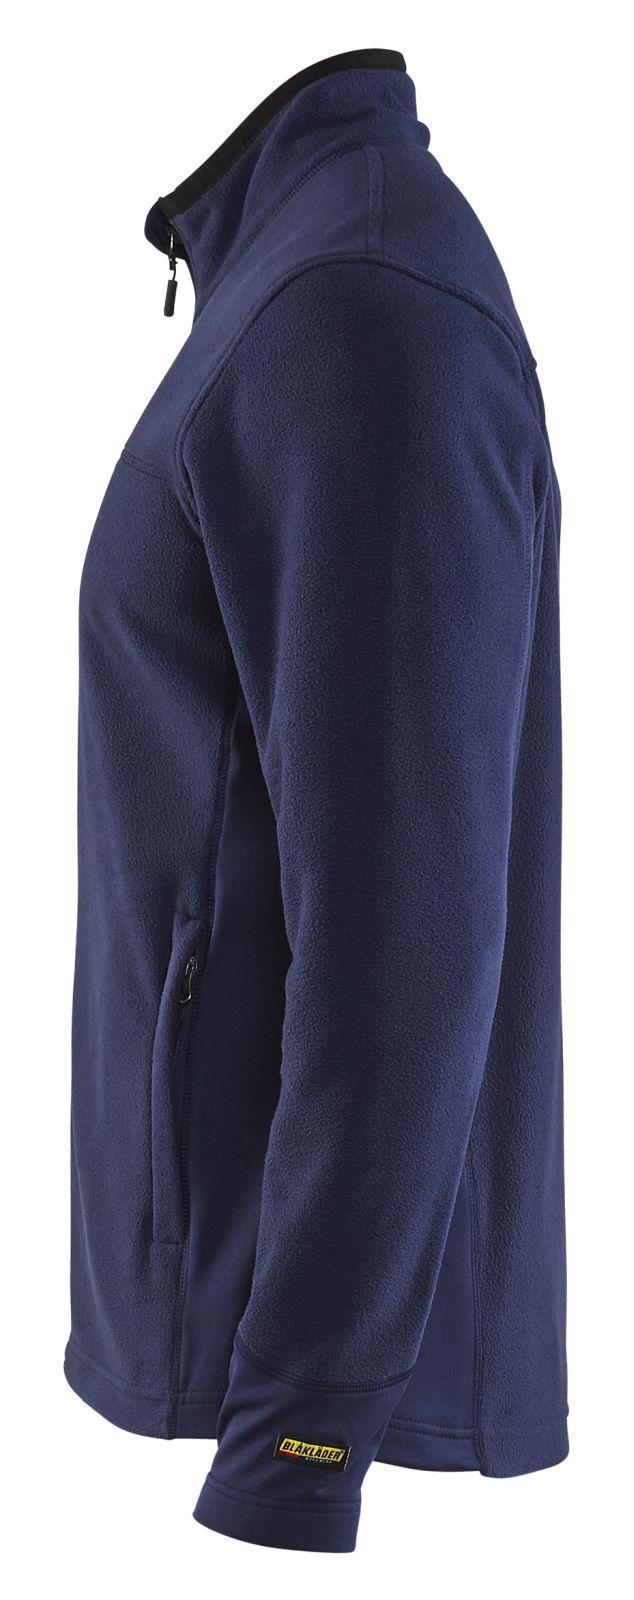 Blaklader Fleece vesten 48951010 marineblauw(8900)